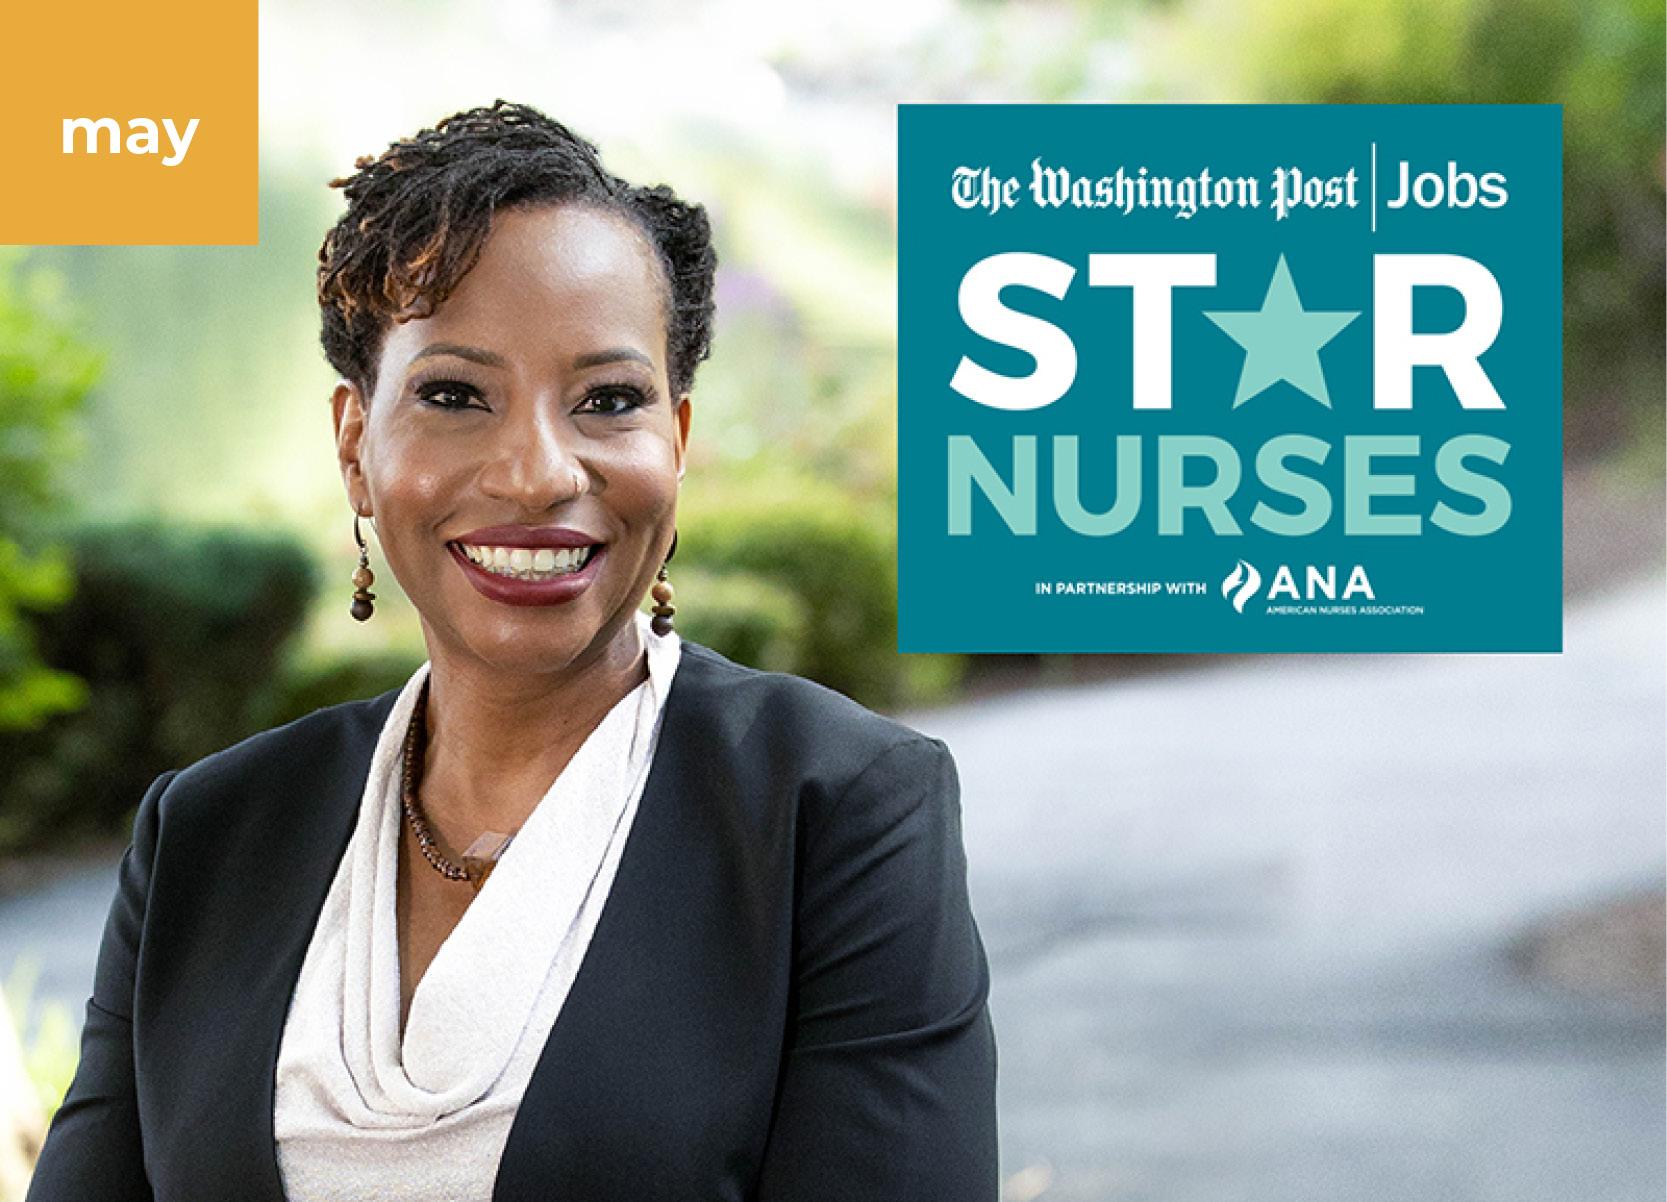 Star Nurses. The Washington Post Jobs, in partnership with ANA